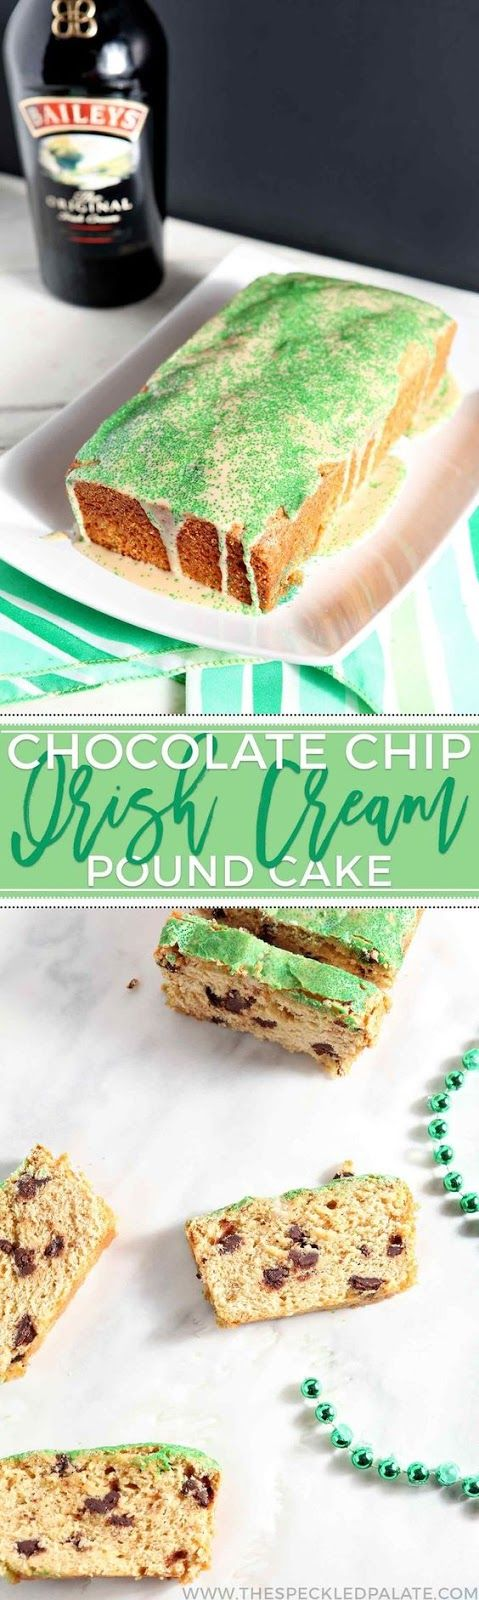 Chocolate Chip Irish Cream Pound Cake | Food And Cake Recipes